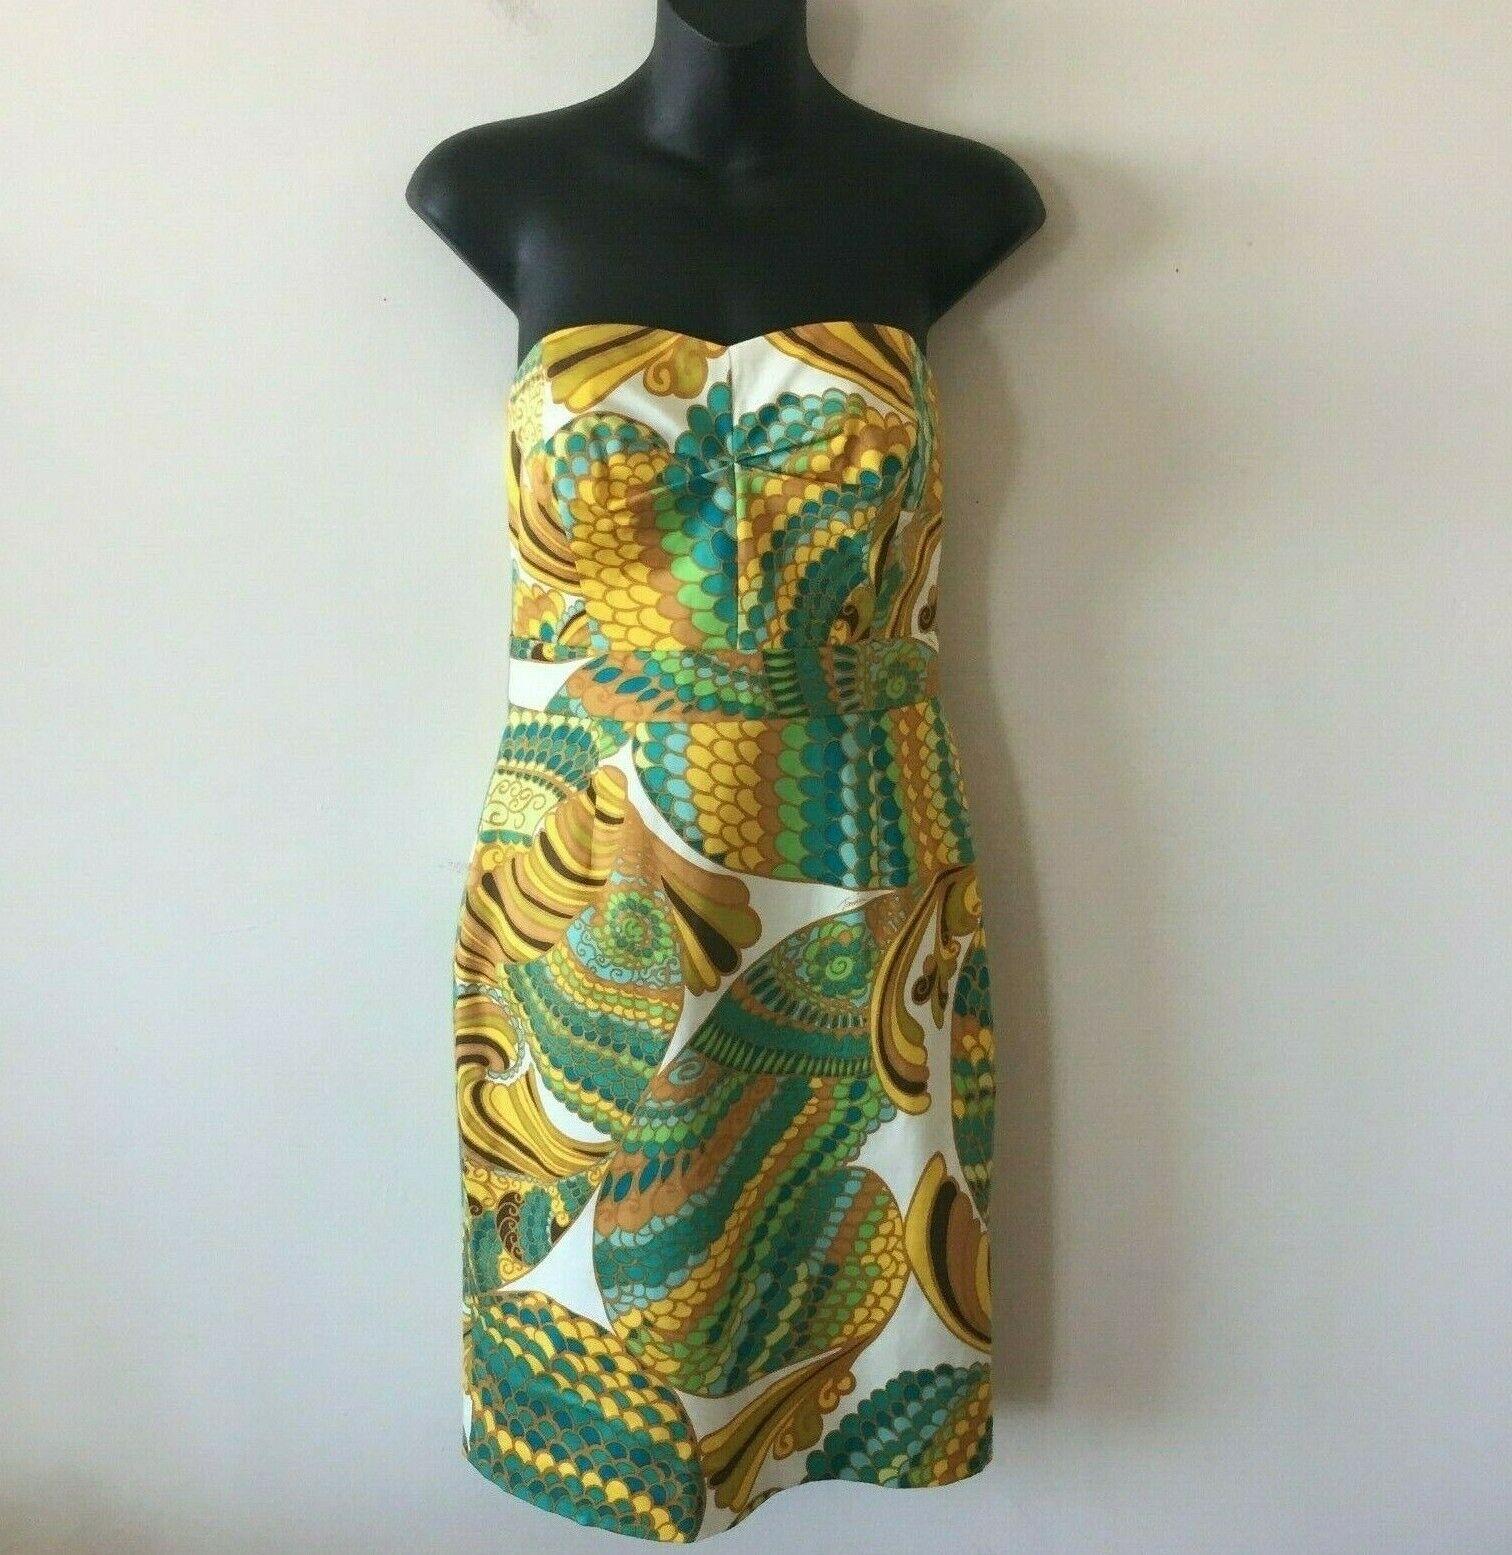 Bananna Republic Trina Turk Collection Strapless Dress Mermaid Woherren 0 NWOT